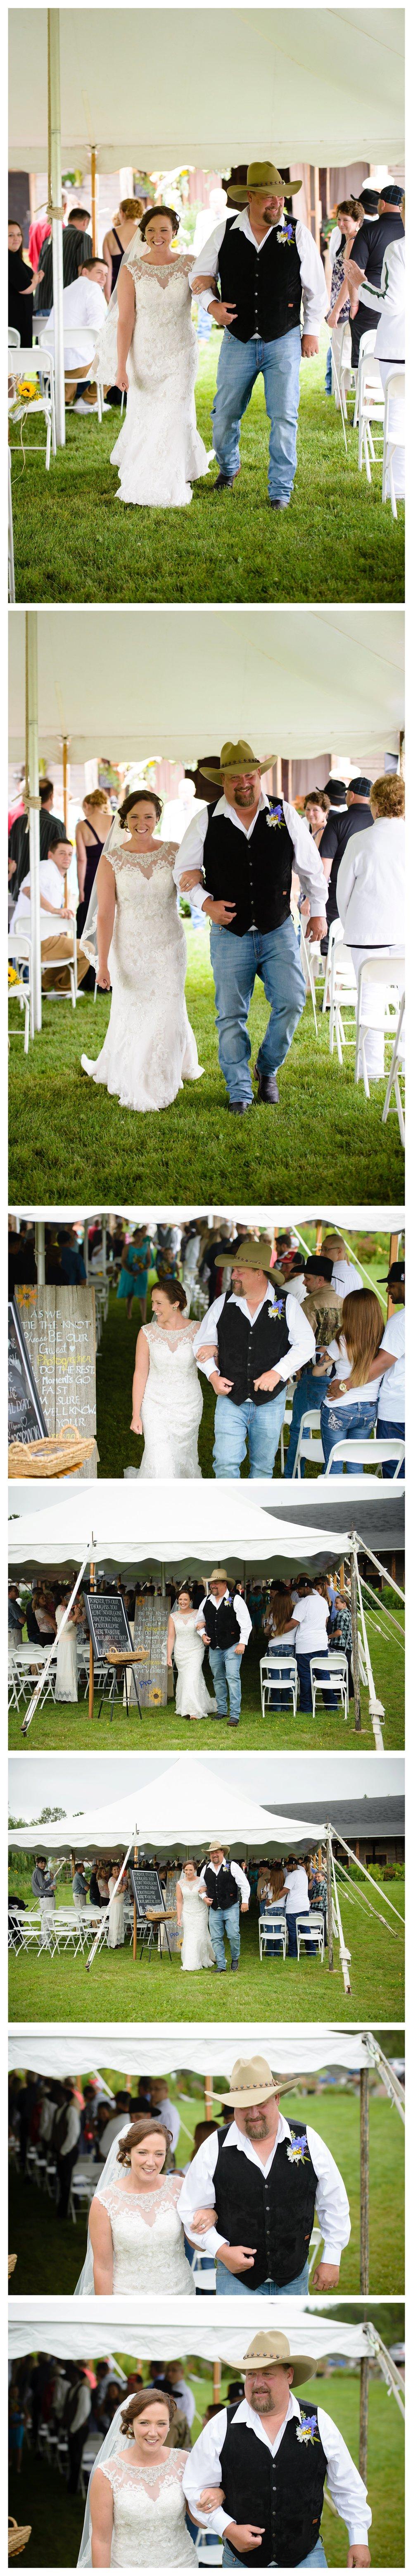 ps 139 photography jen jensen ashland freehands farm wedding northwoods_0034.jpg